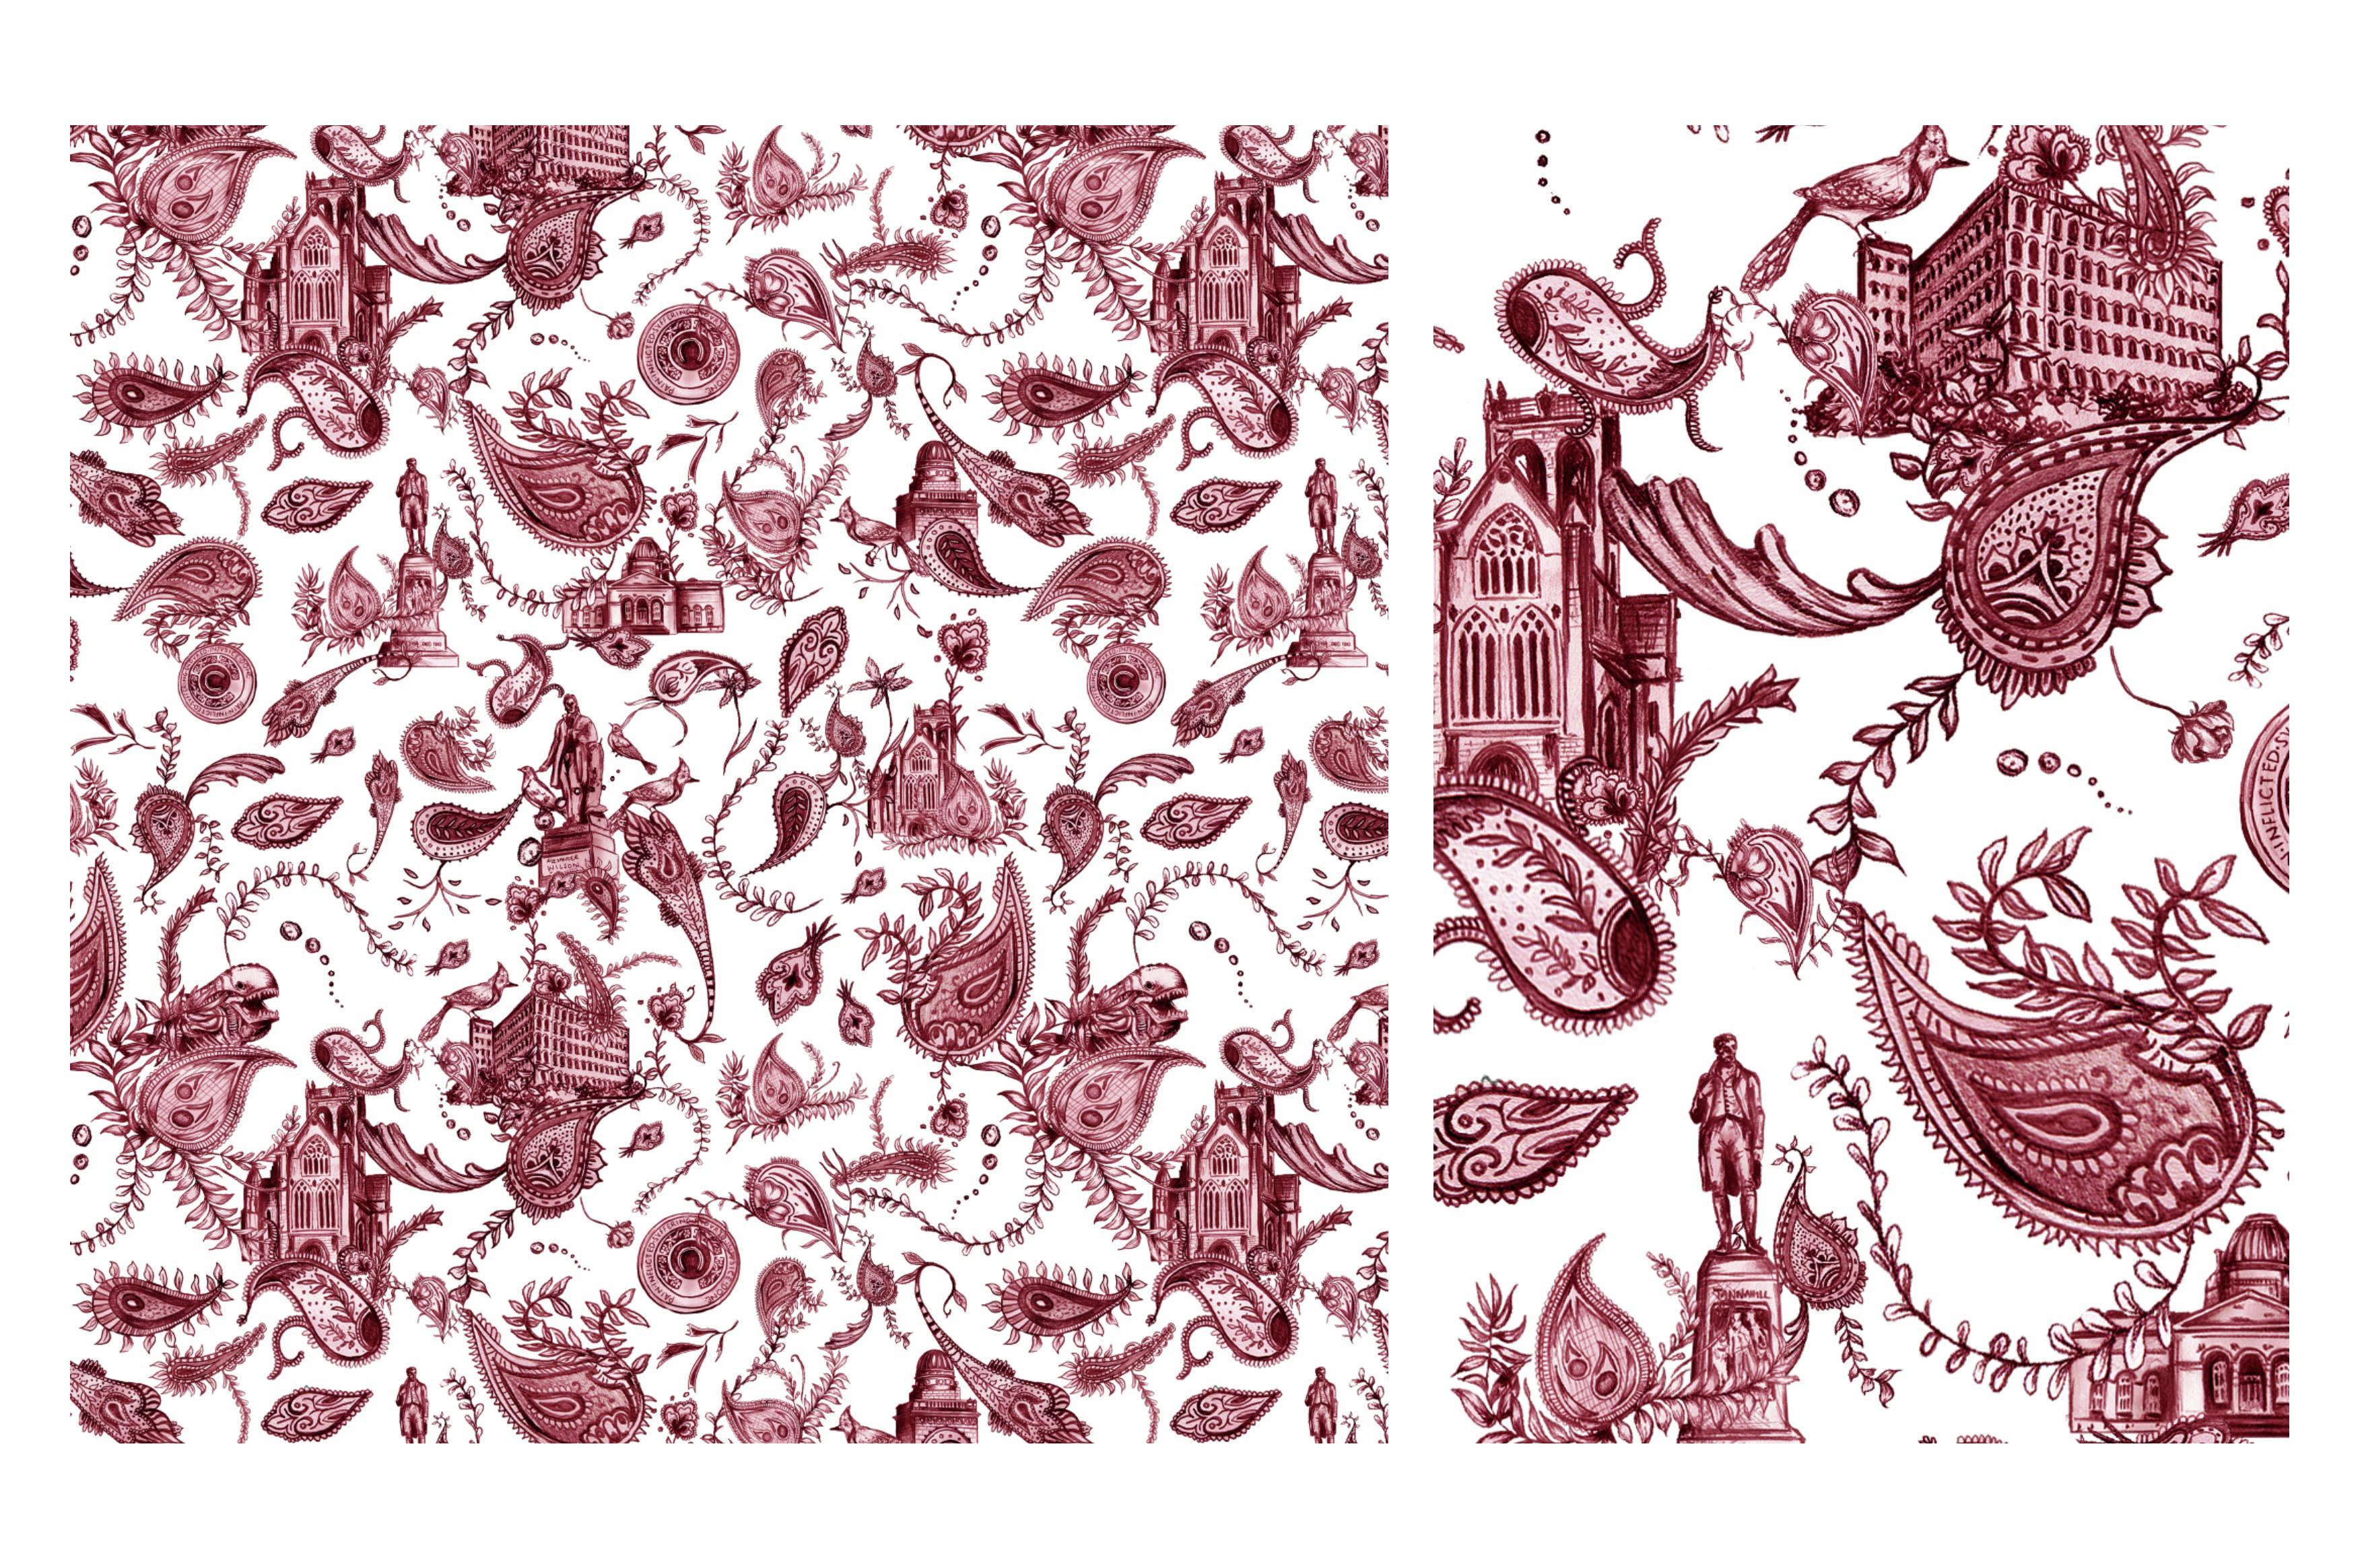 paisley, pattern,bowtie,bow,tie,print,design,josef mcfadden,beard,handmade in scotland,glasgow,renfrewshire,edinburgh,scotland,mens fashion,men,menswear,mens style,dapper,mens accessories,wedding bow ties,paislig,paisley abbey, paisley observatory,incube renfrewshire,handmade bowties, bowties in glasgow, ties glasgow, mens ties scotland, mens ties glasgow, mens wedding ties, scotland, paisley print, paisley witches, Anchor Mills